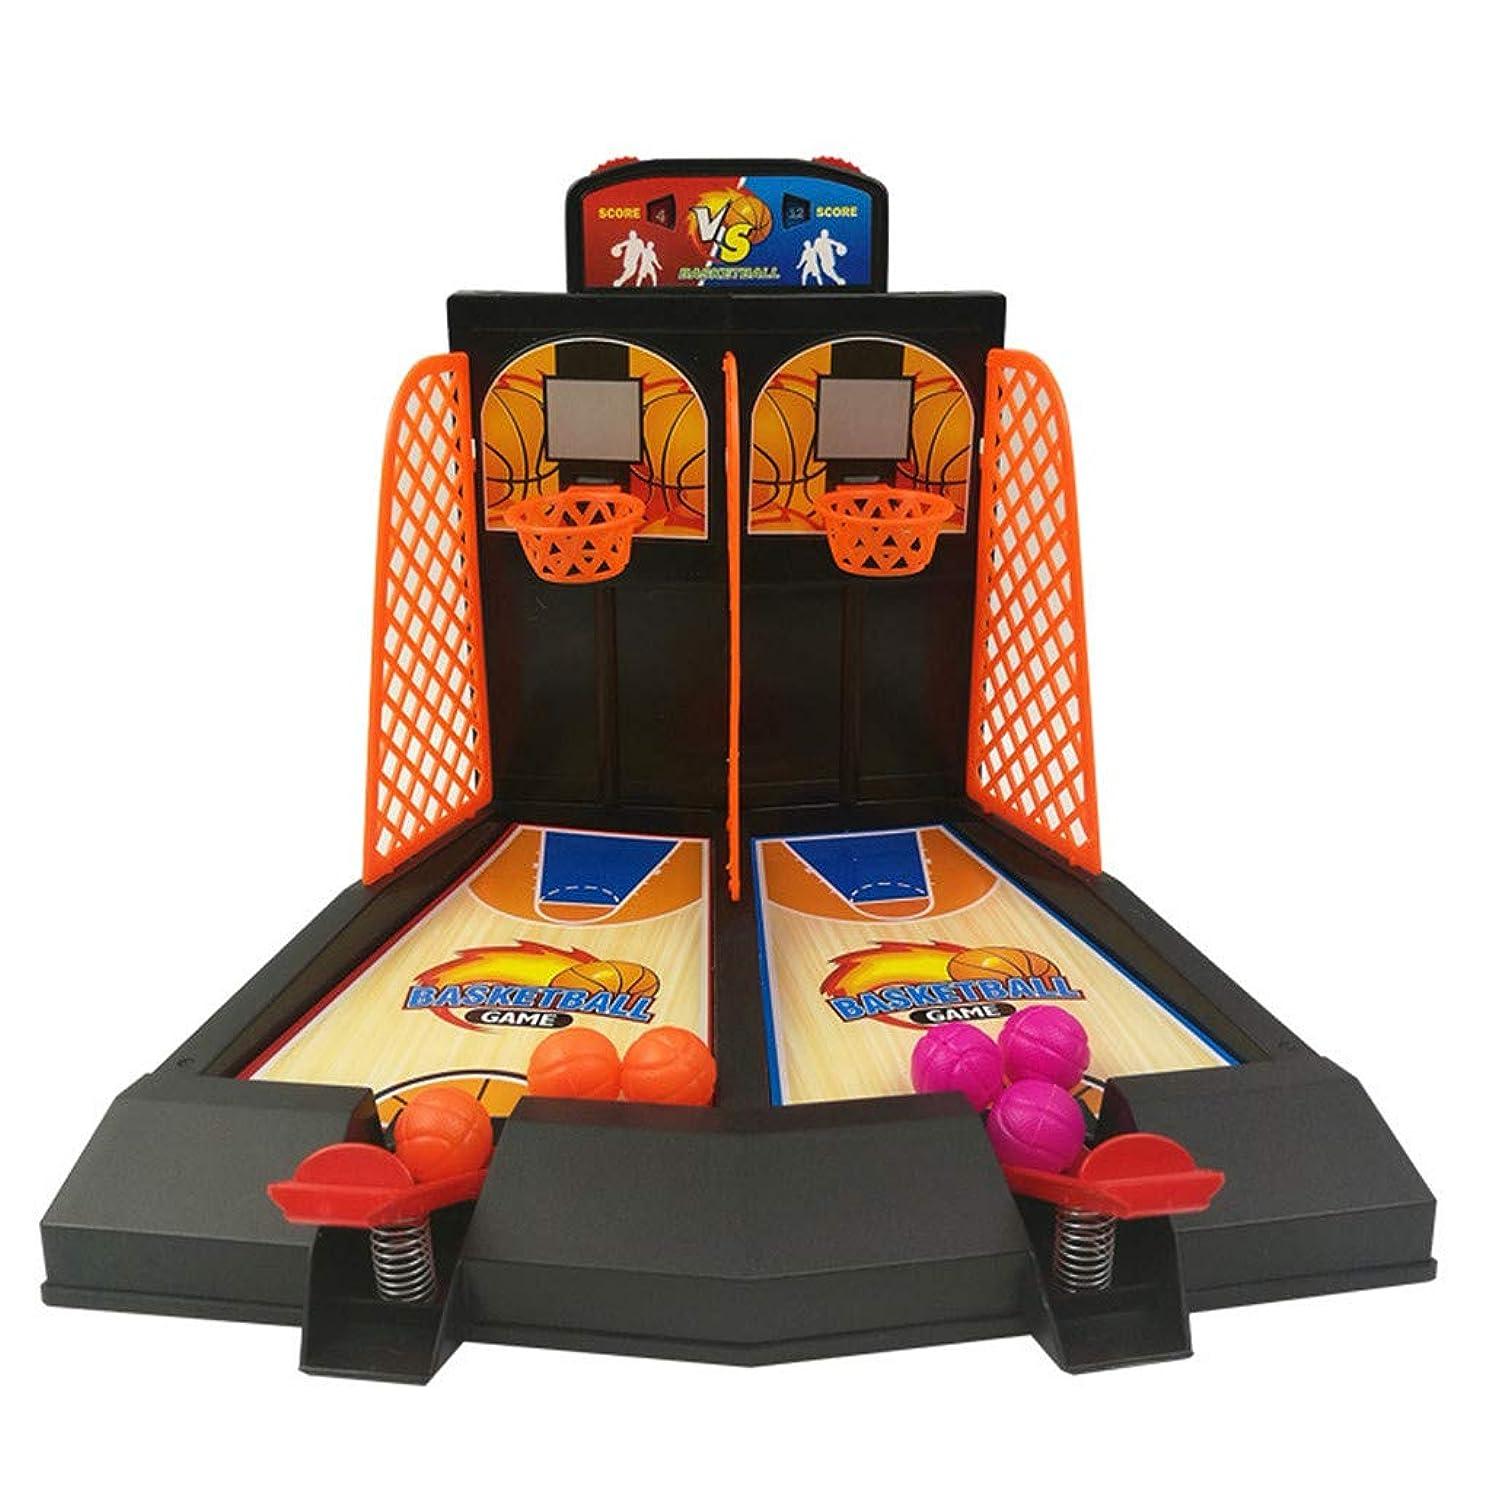 ??2-Player Desktop Table Basketball Games Classic Basketball Shooting Toy